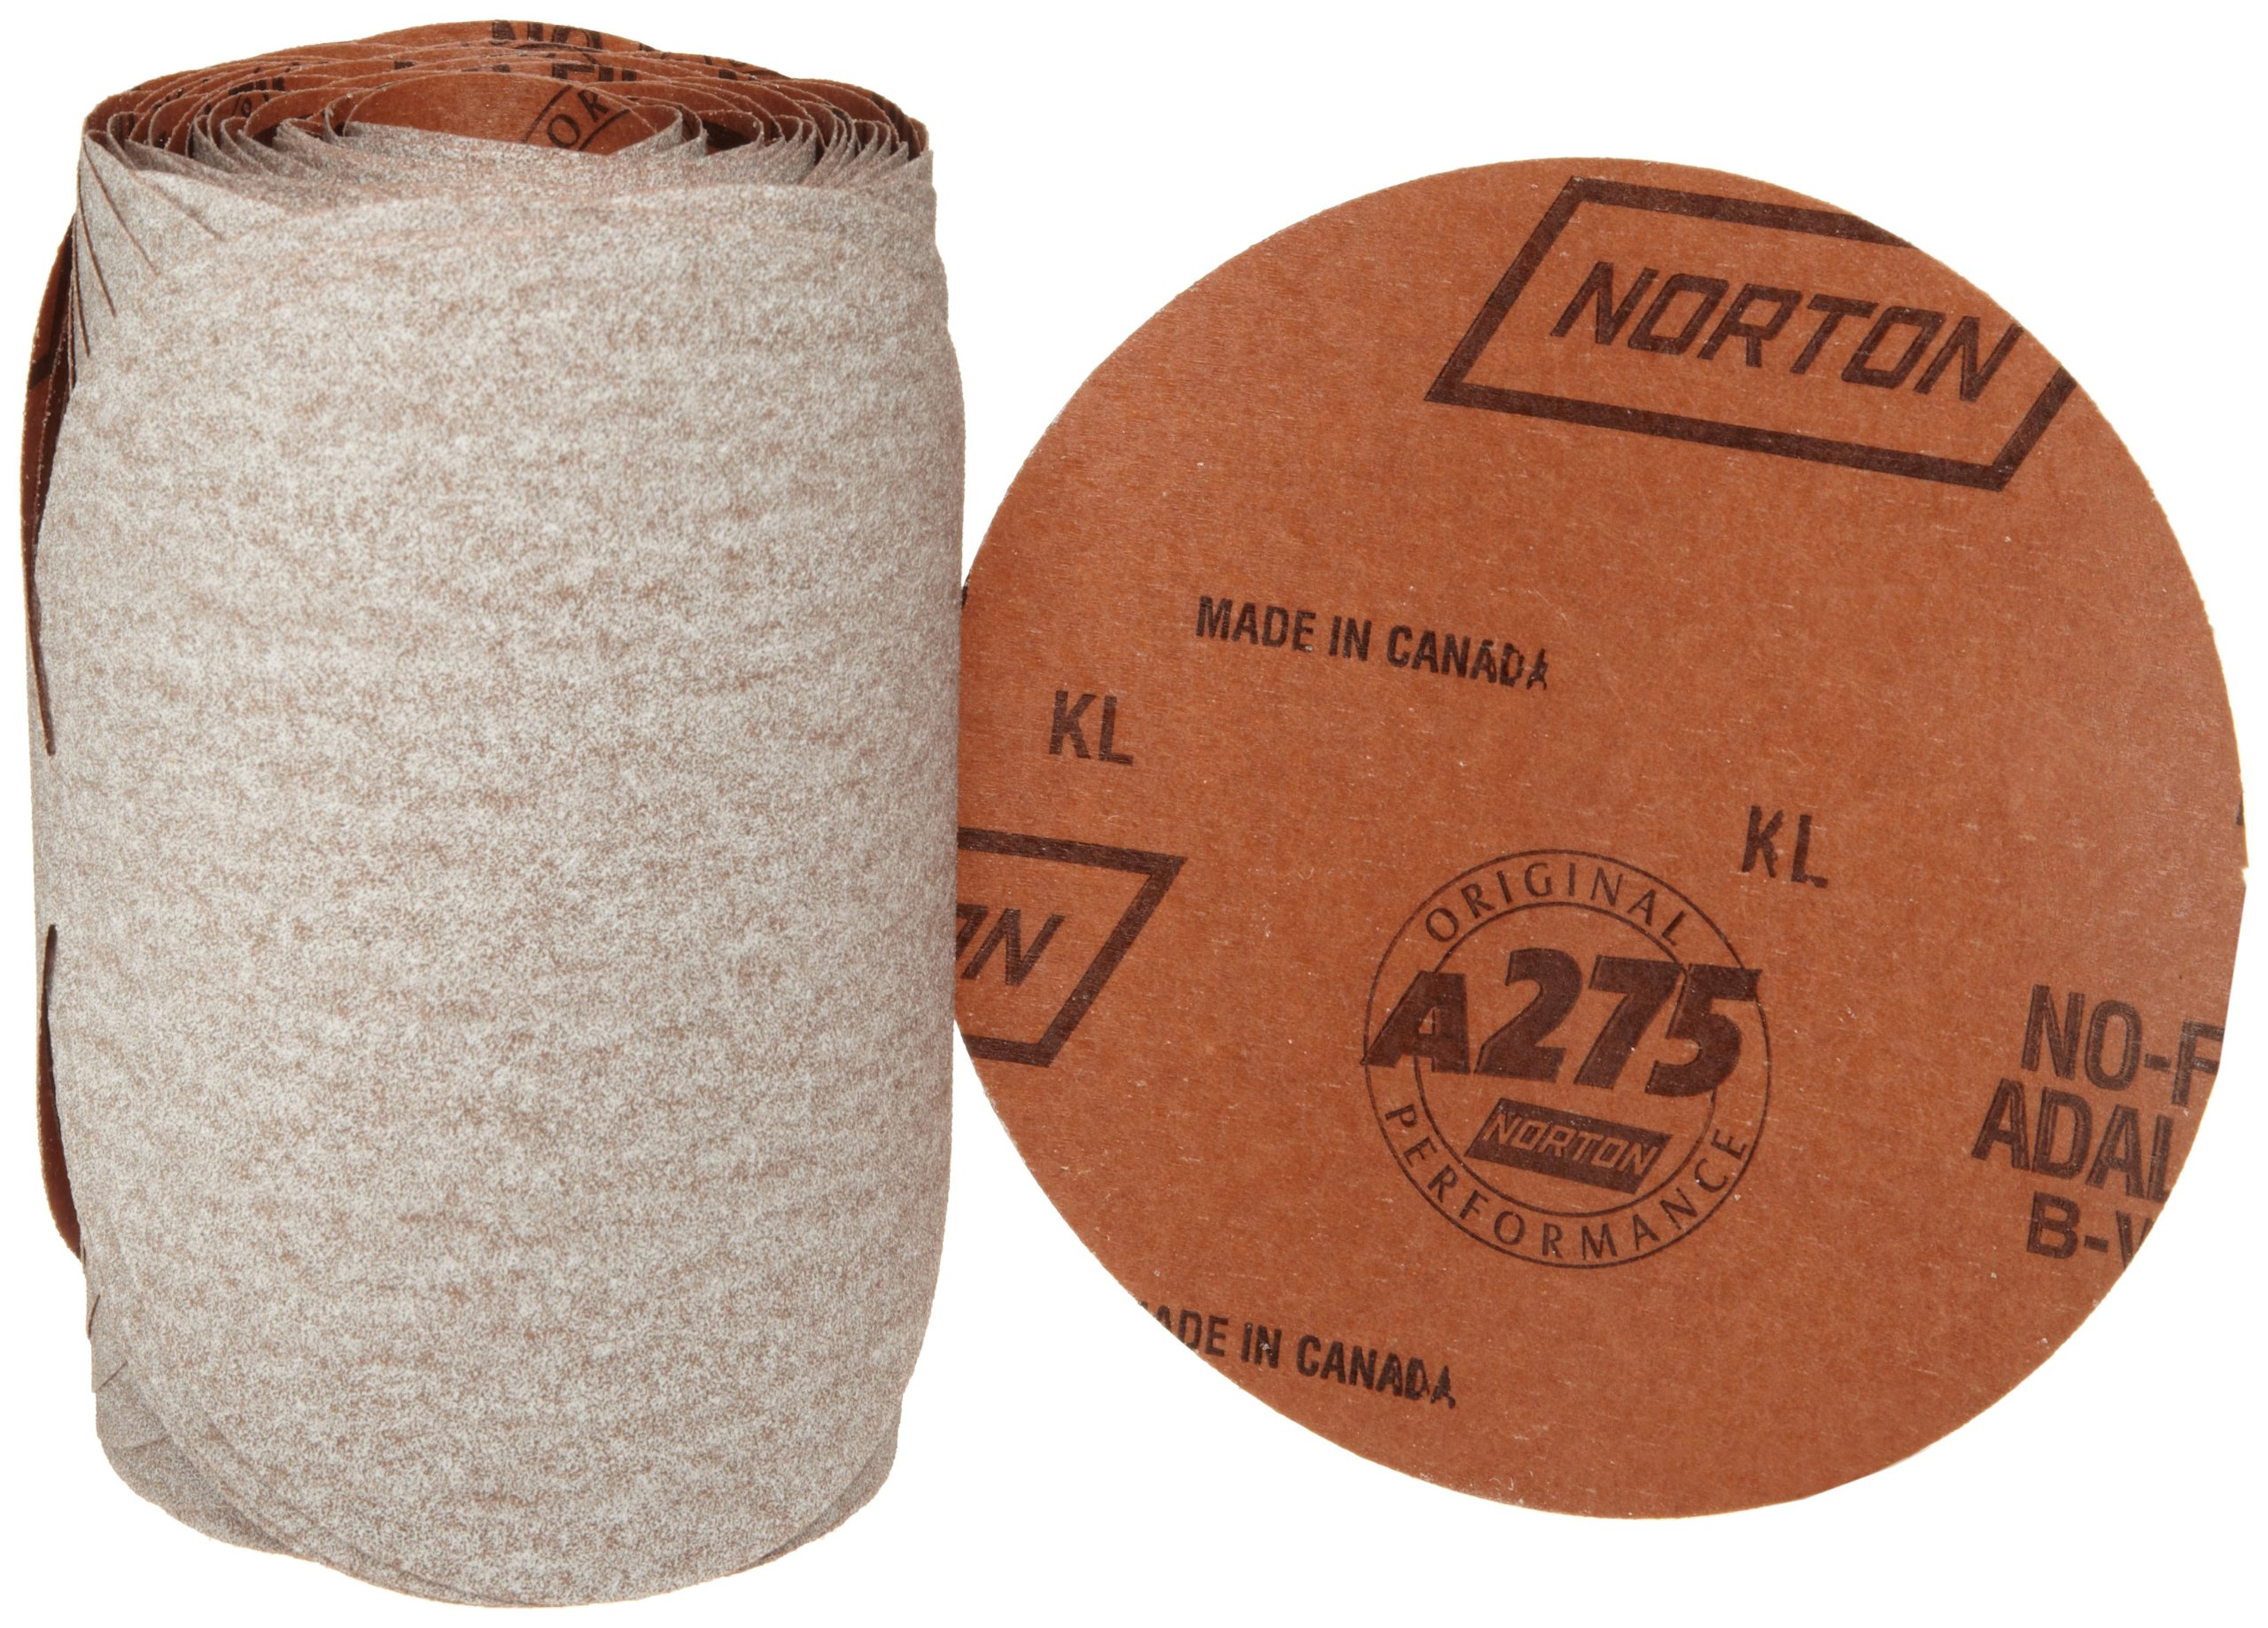 Norton A275 No-Fil Adalox Paper Abrasive Disc, Fiber Backing, Pressure-Sensitive Adhesive, Aluminium Oxide, 6'' Diameter, Grit 80 (Roll of 100)